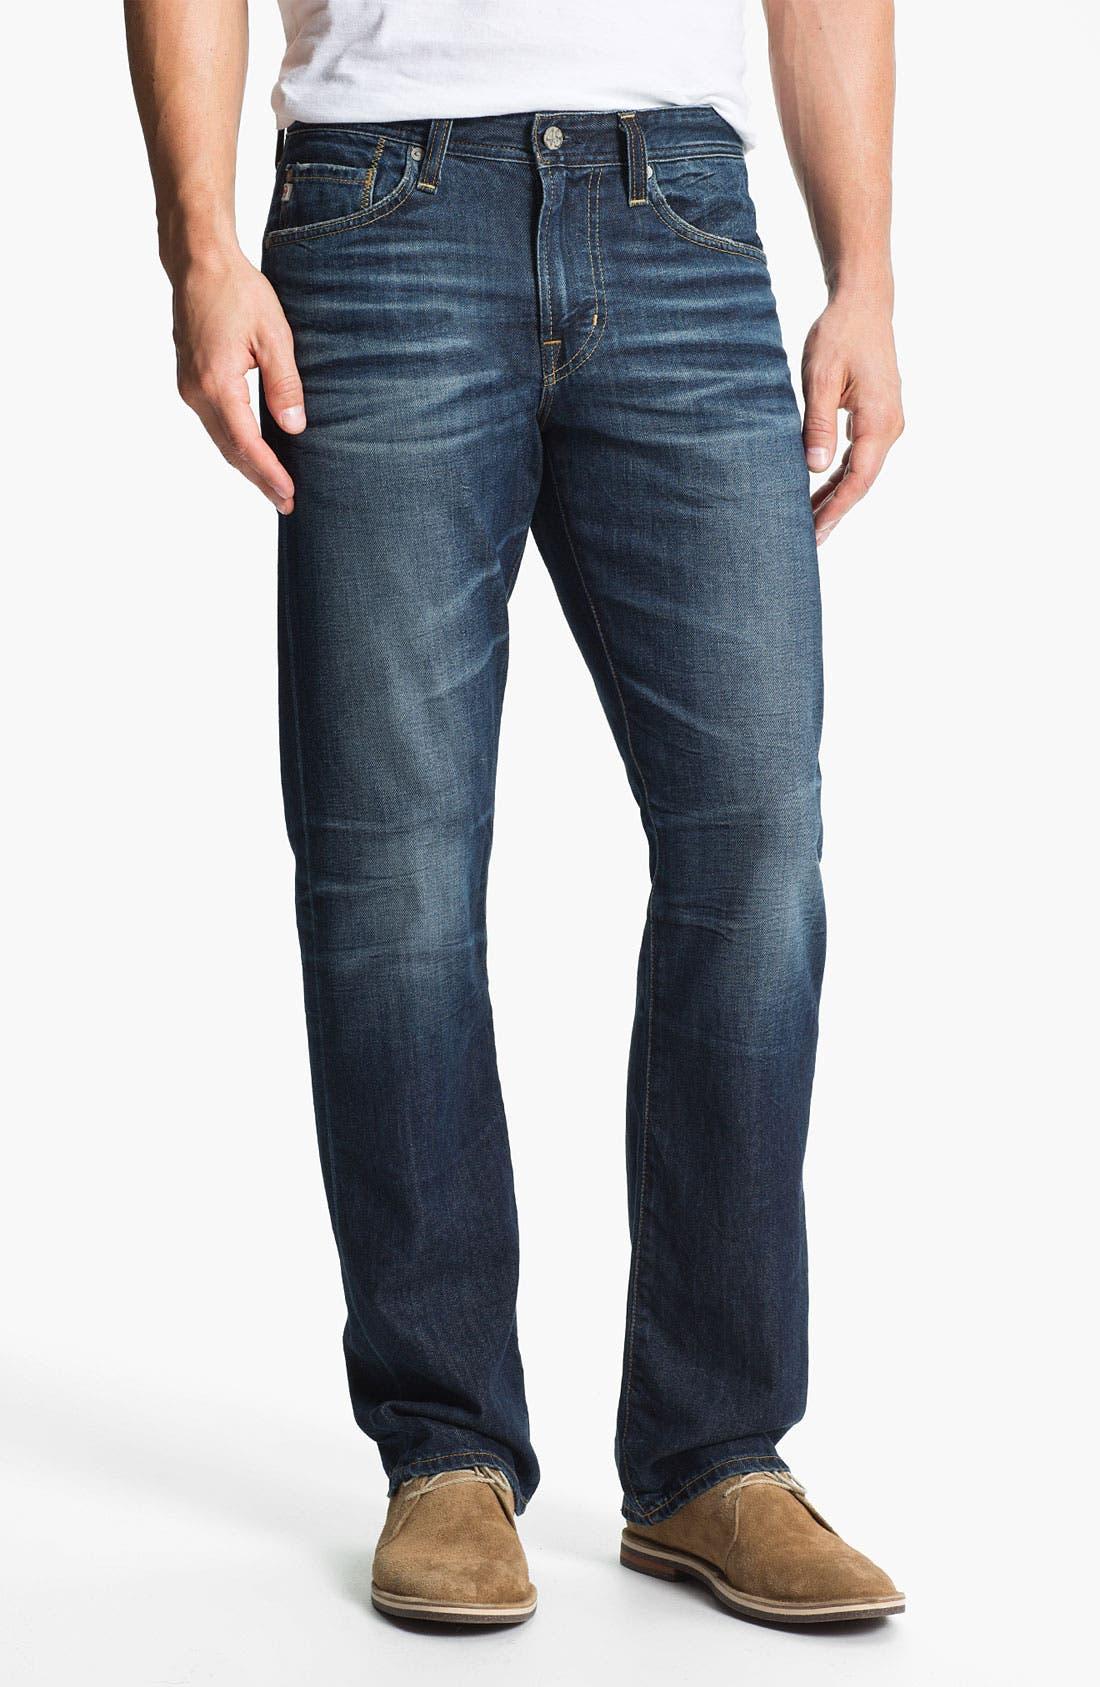 Alternate Image 1 Selected - AG Jeans 'Protégé' Straight Leg Jeans (8-Year Lounge)